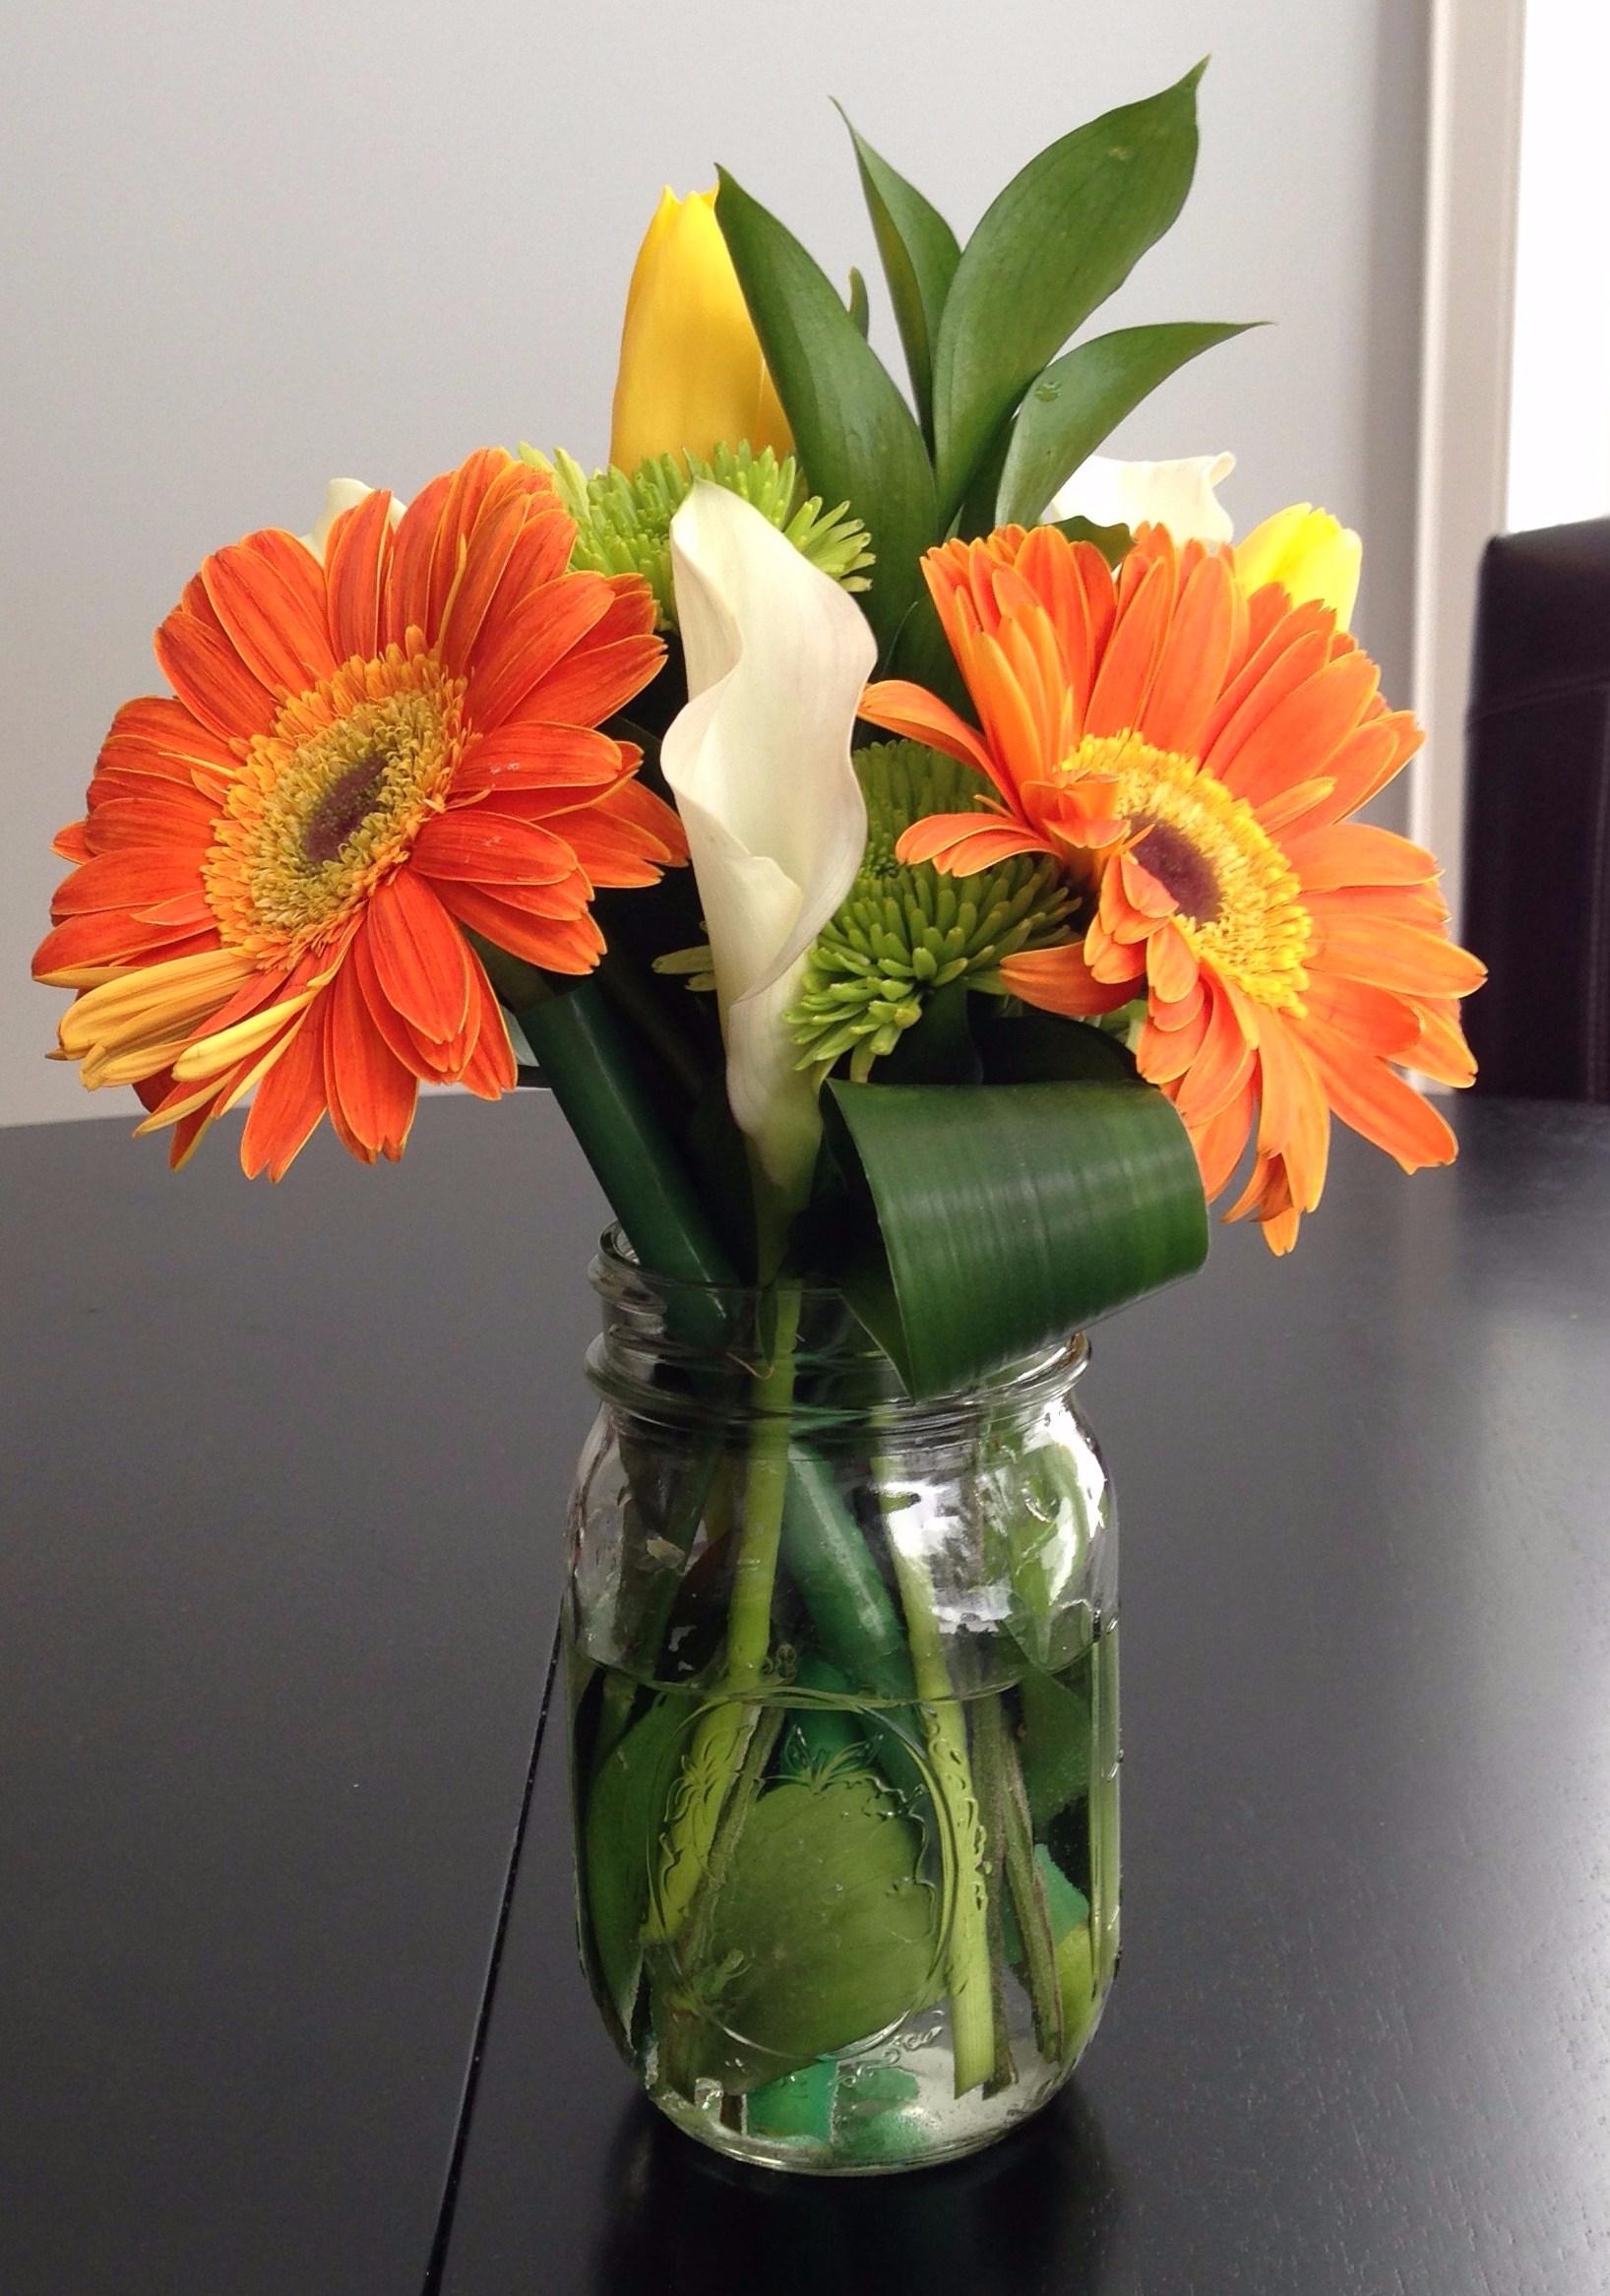 orange flowers IMG_2406